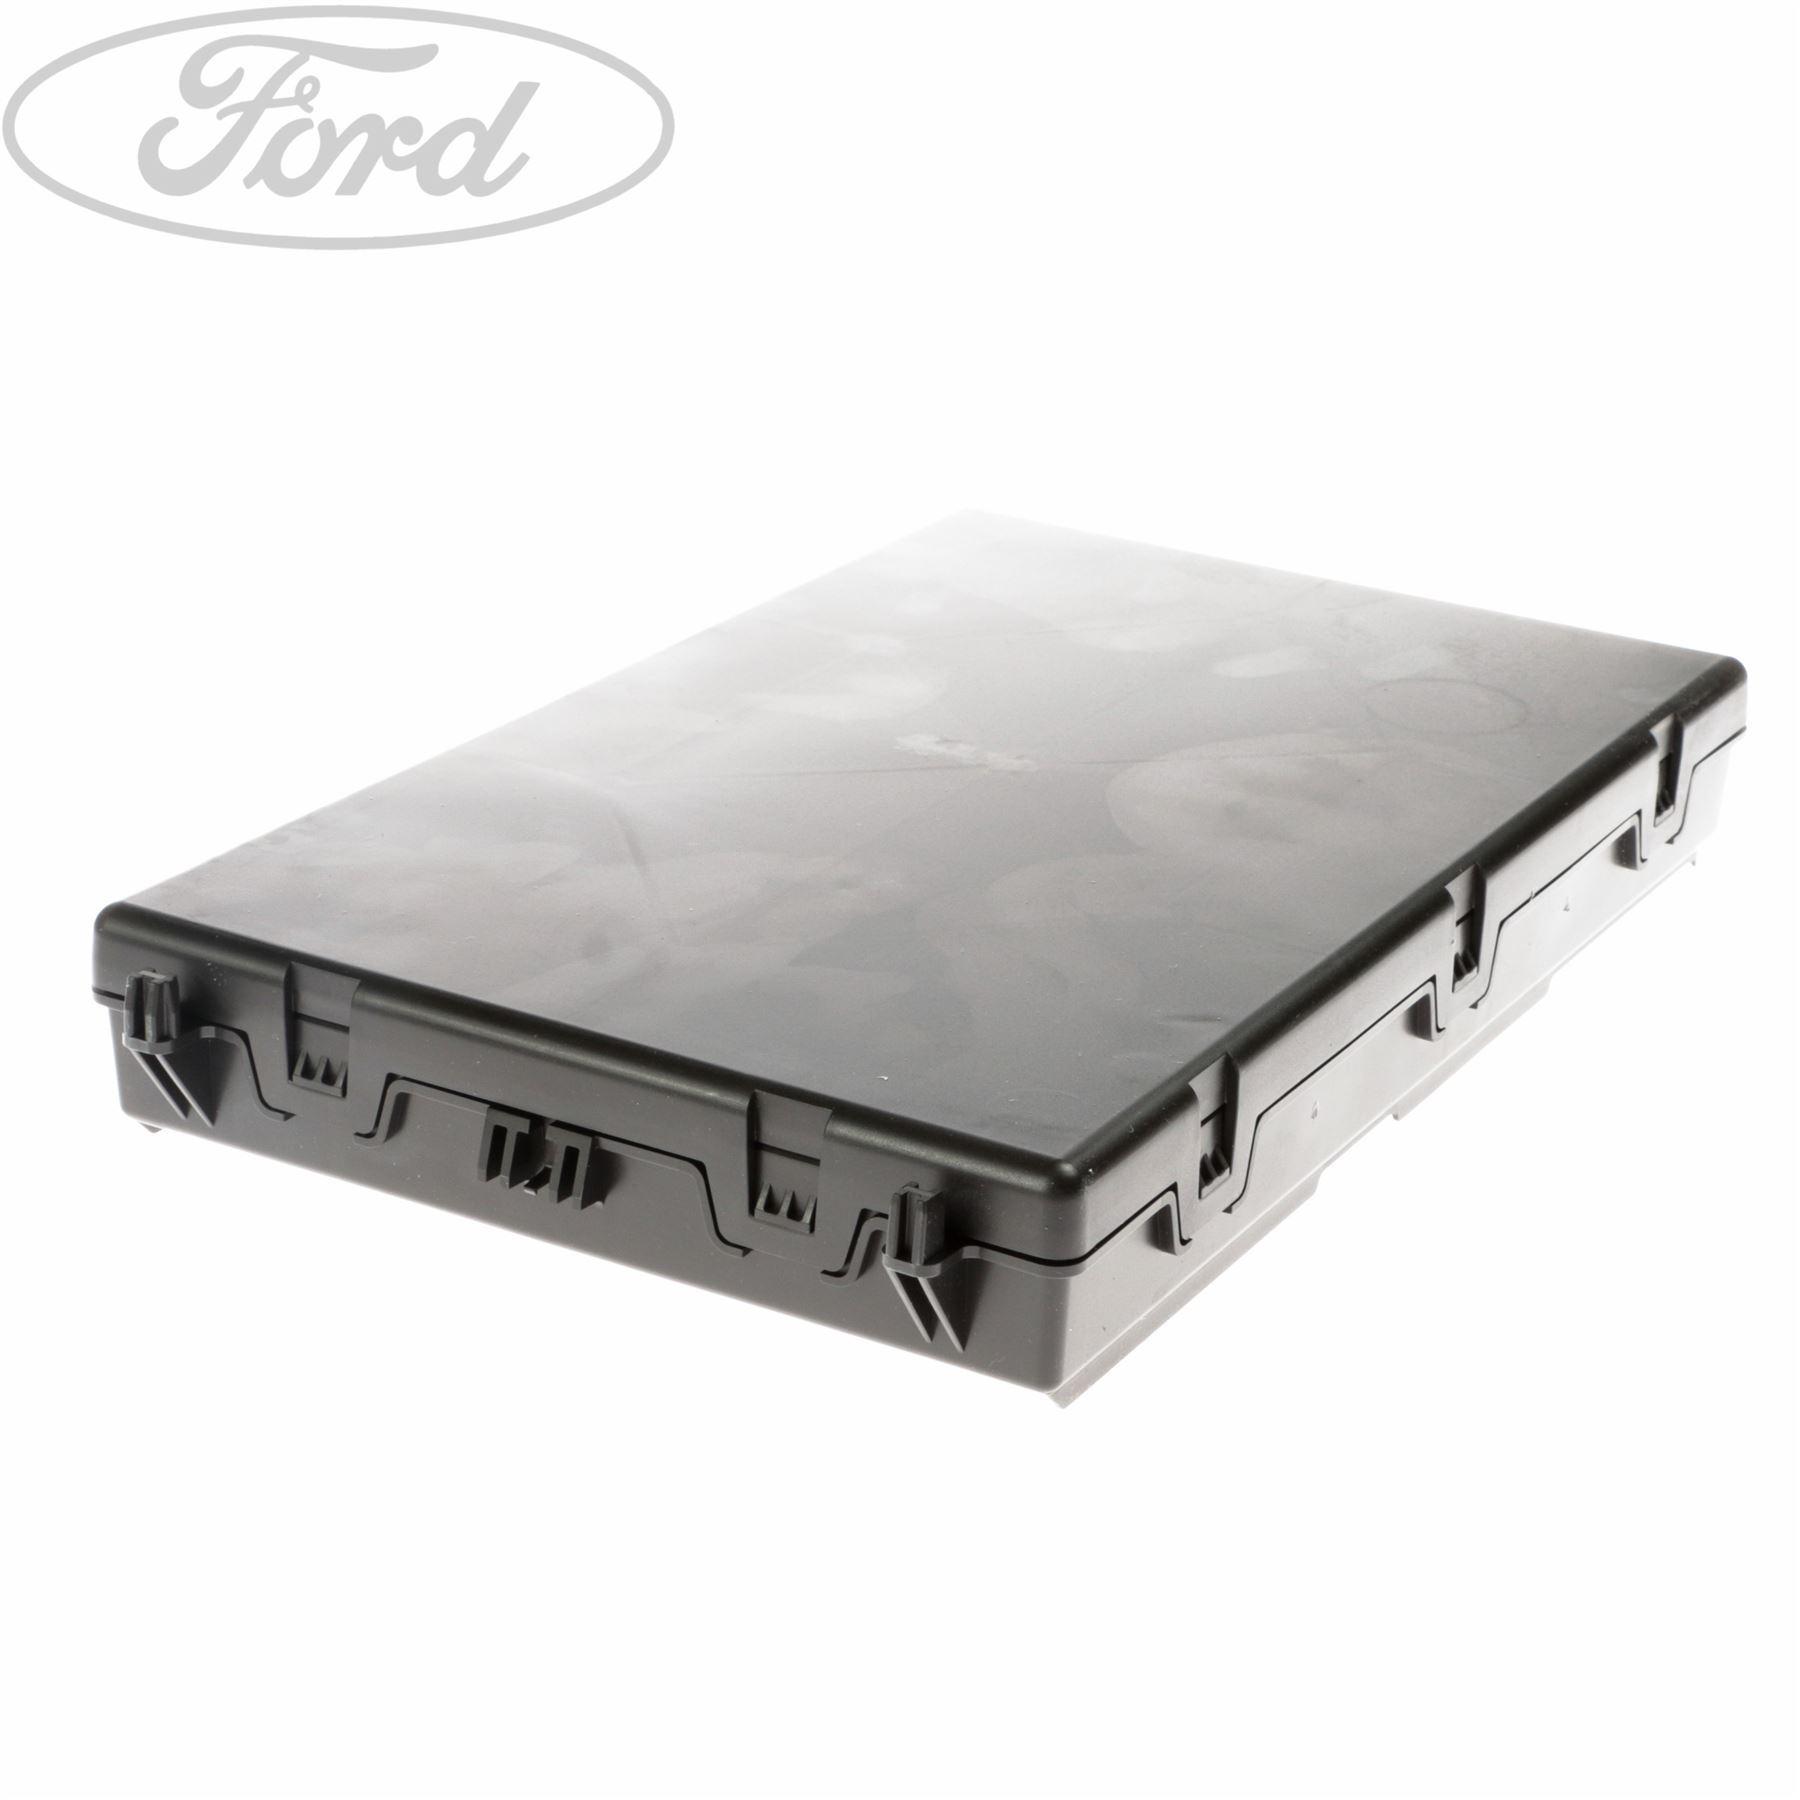 hight resolution of genuine ford transit mk7 fuse junction panel 2019449